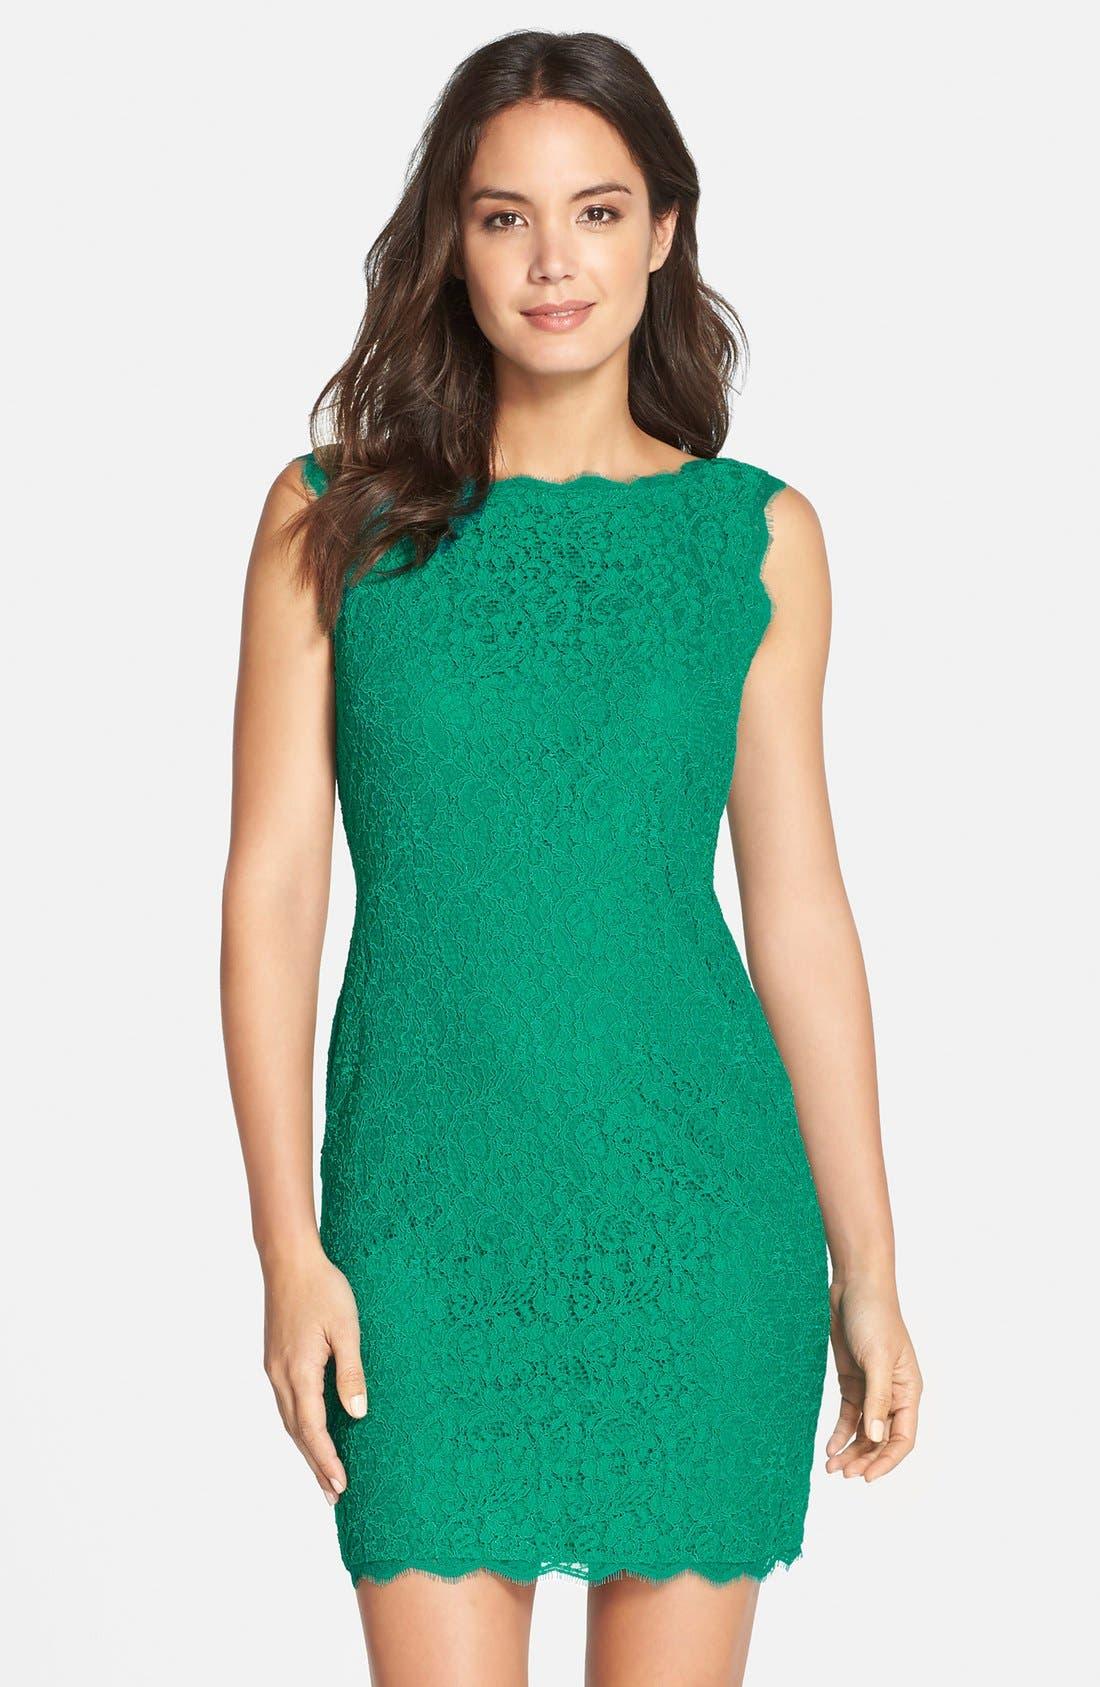 Alternate Image 1 Selected - Adrianna Papell Boatneck Lace Sheath Dress (Regular & Petite)